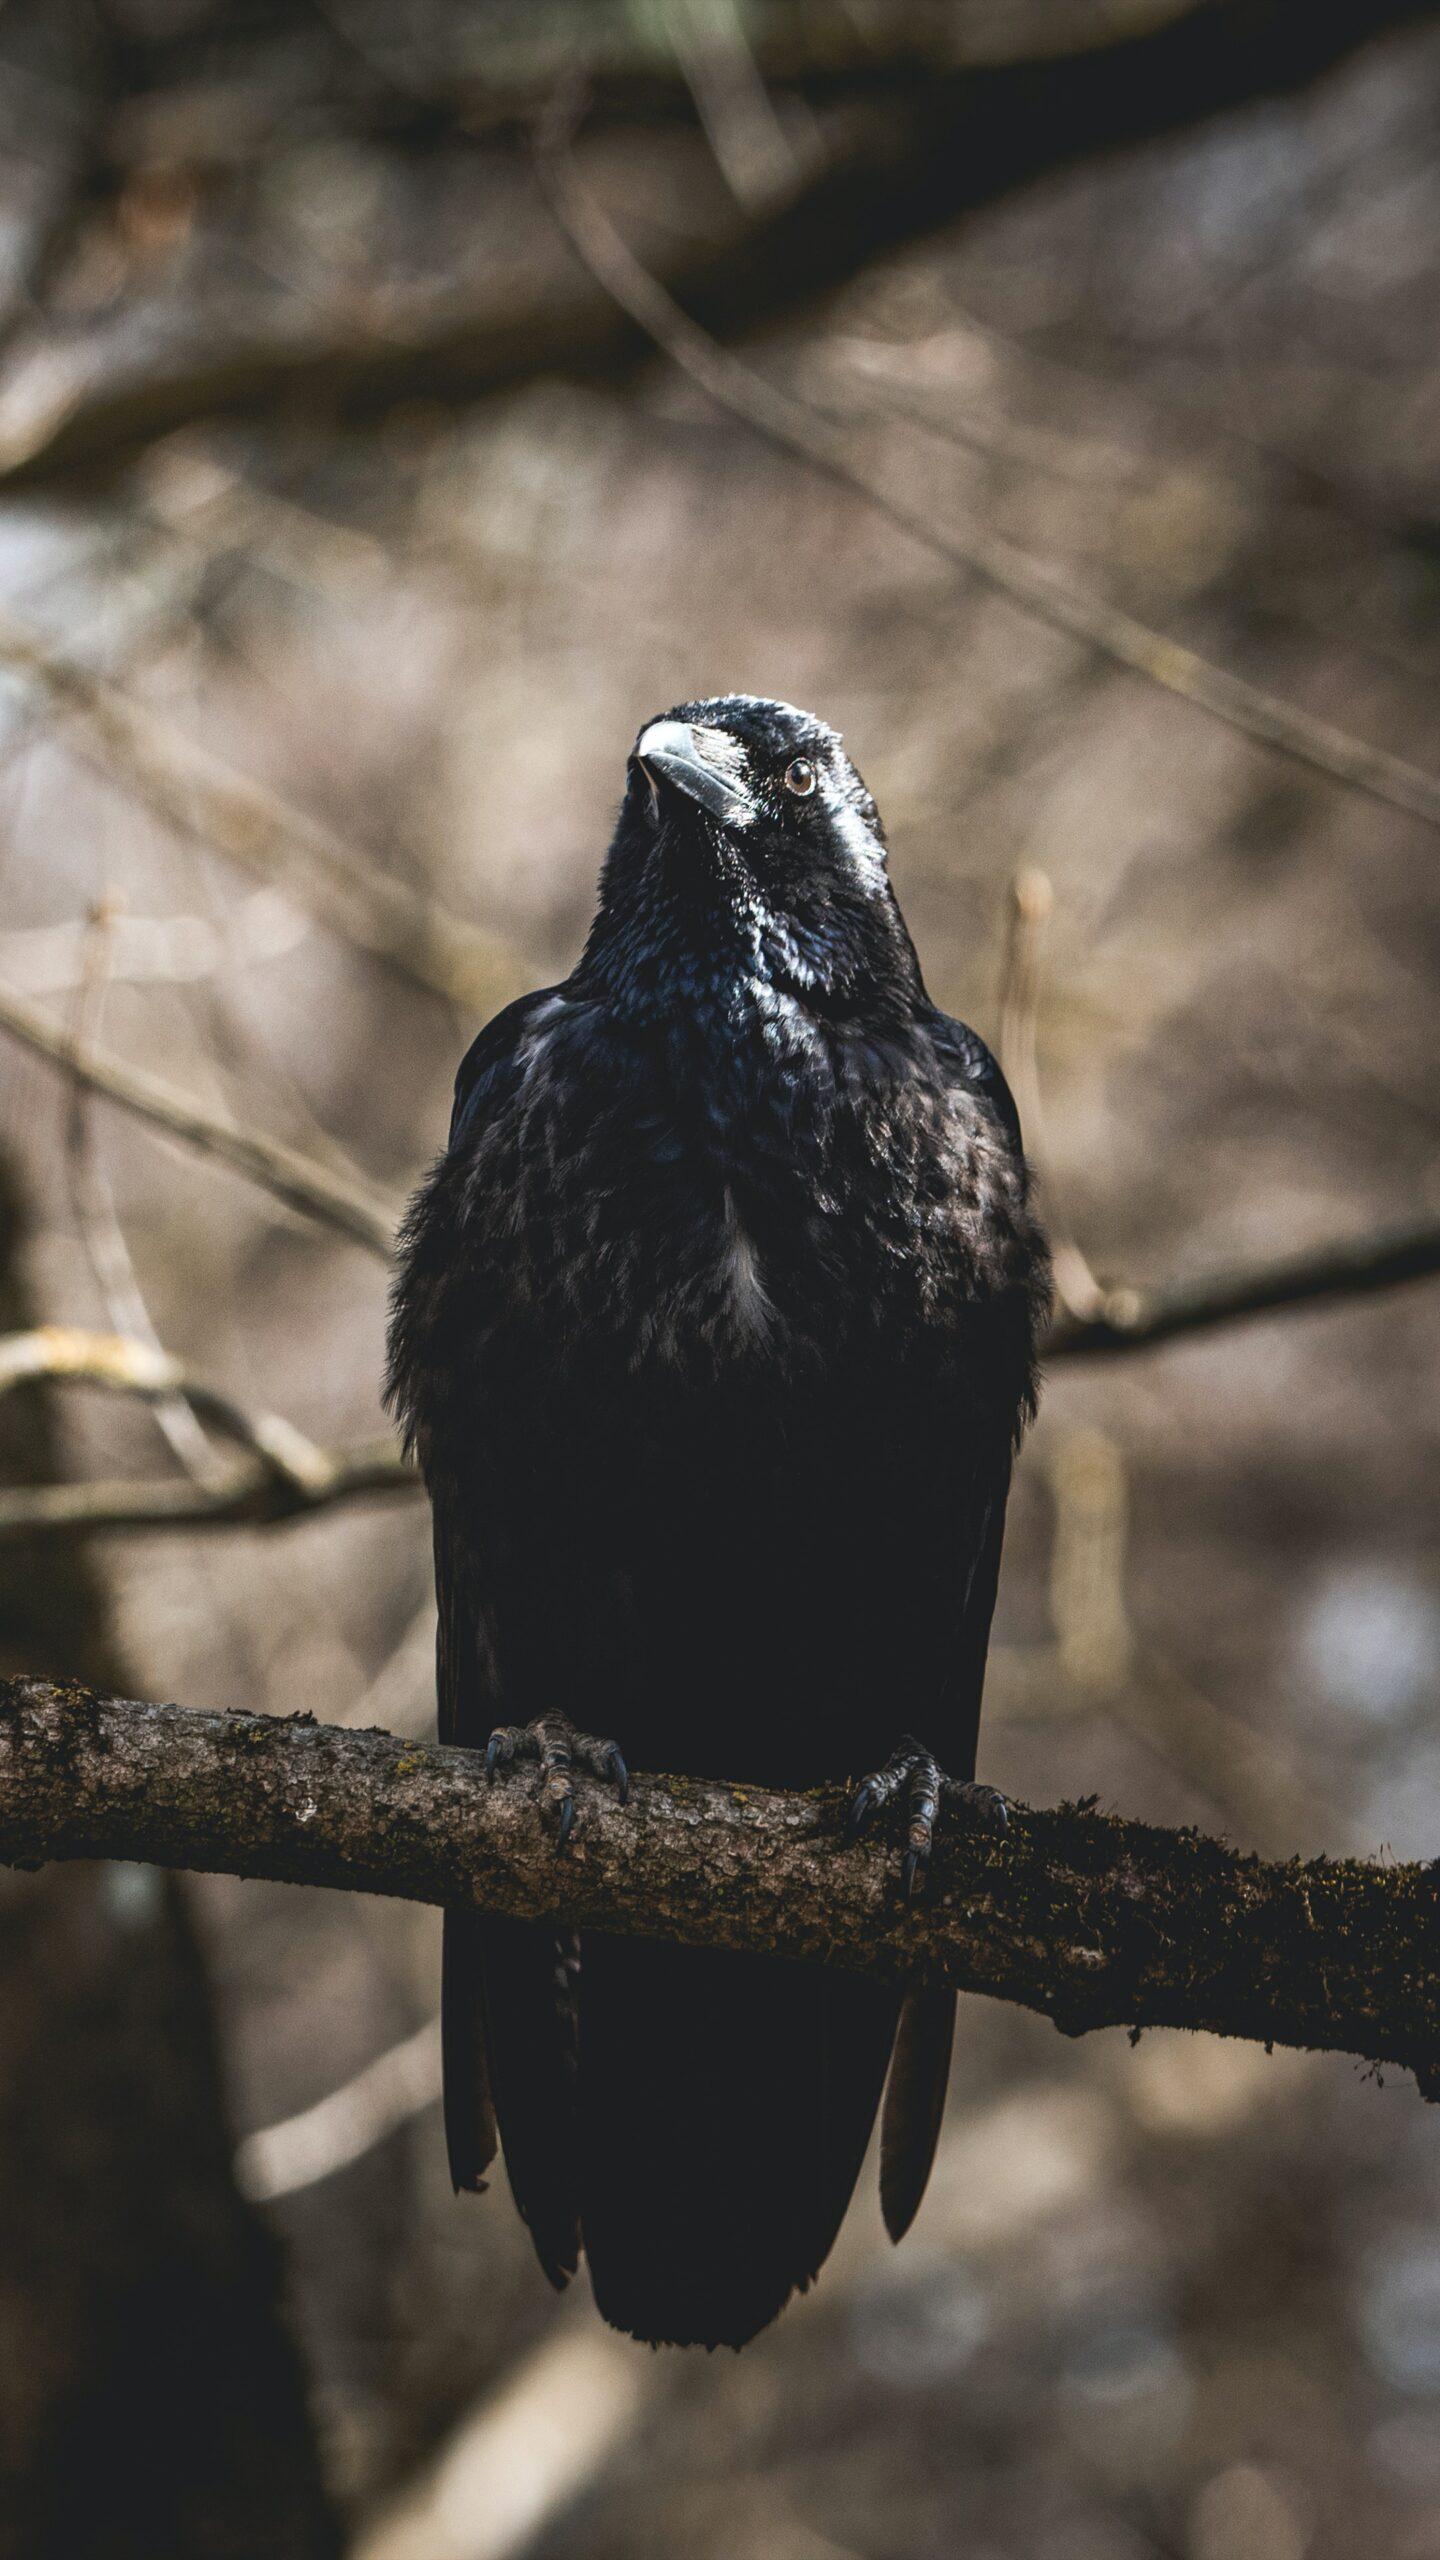 Raven on tree branch by Valentin Petkov on Unsplash